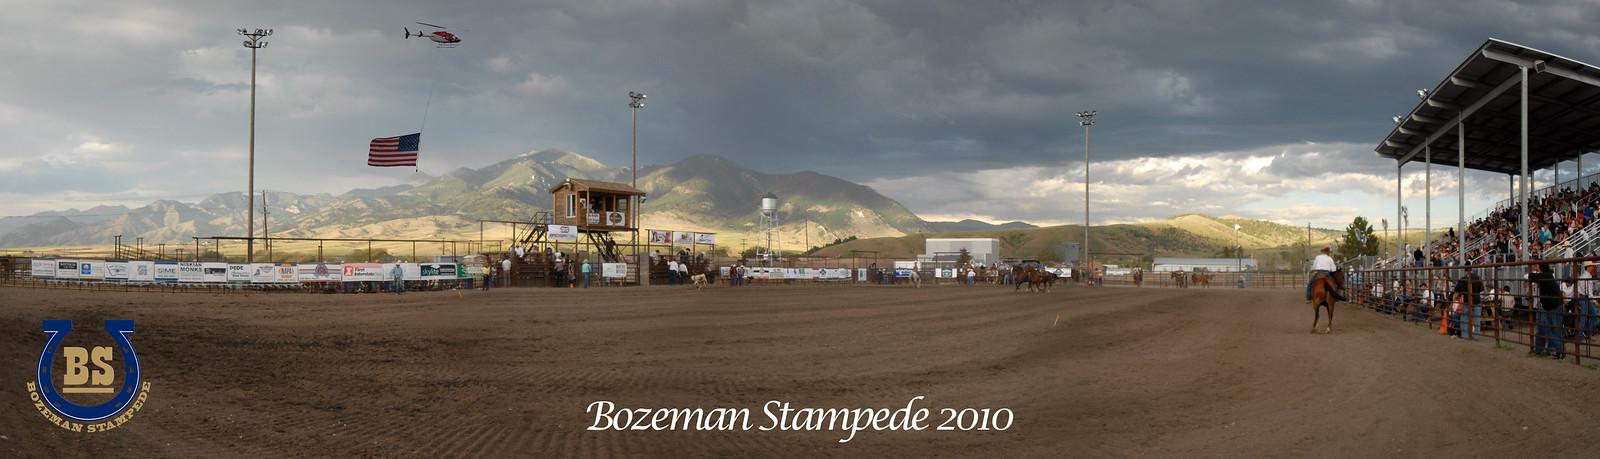 Bozeman Stampede 2010